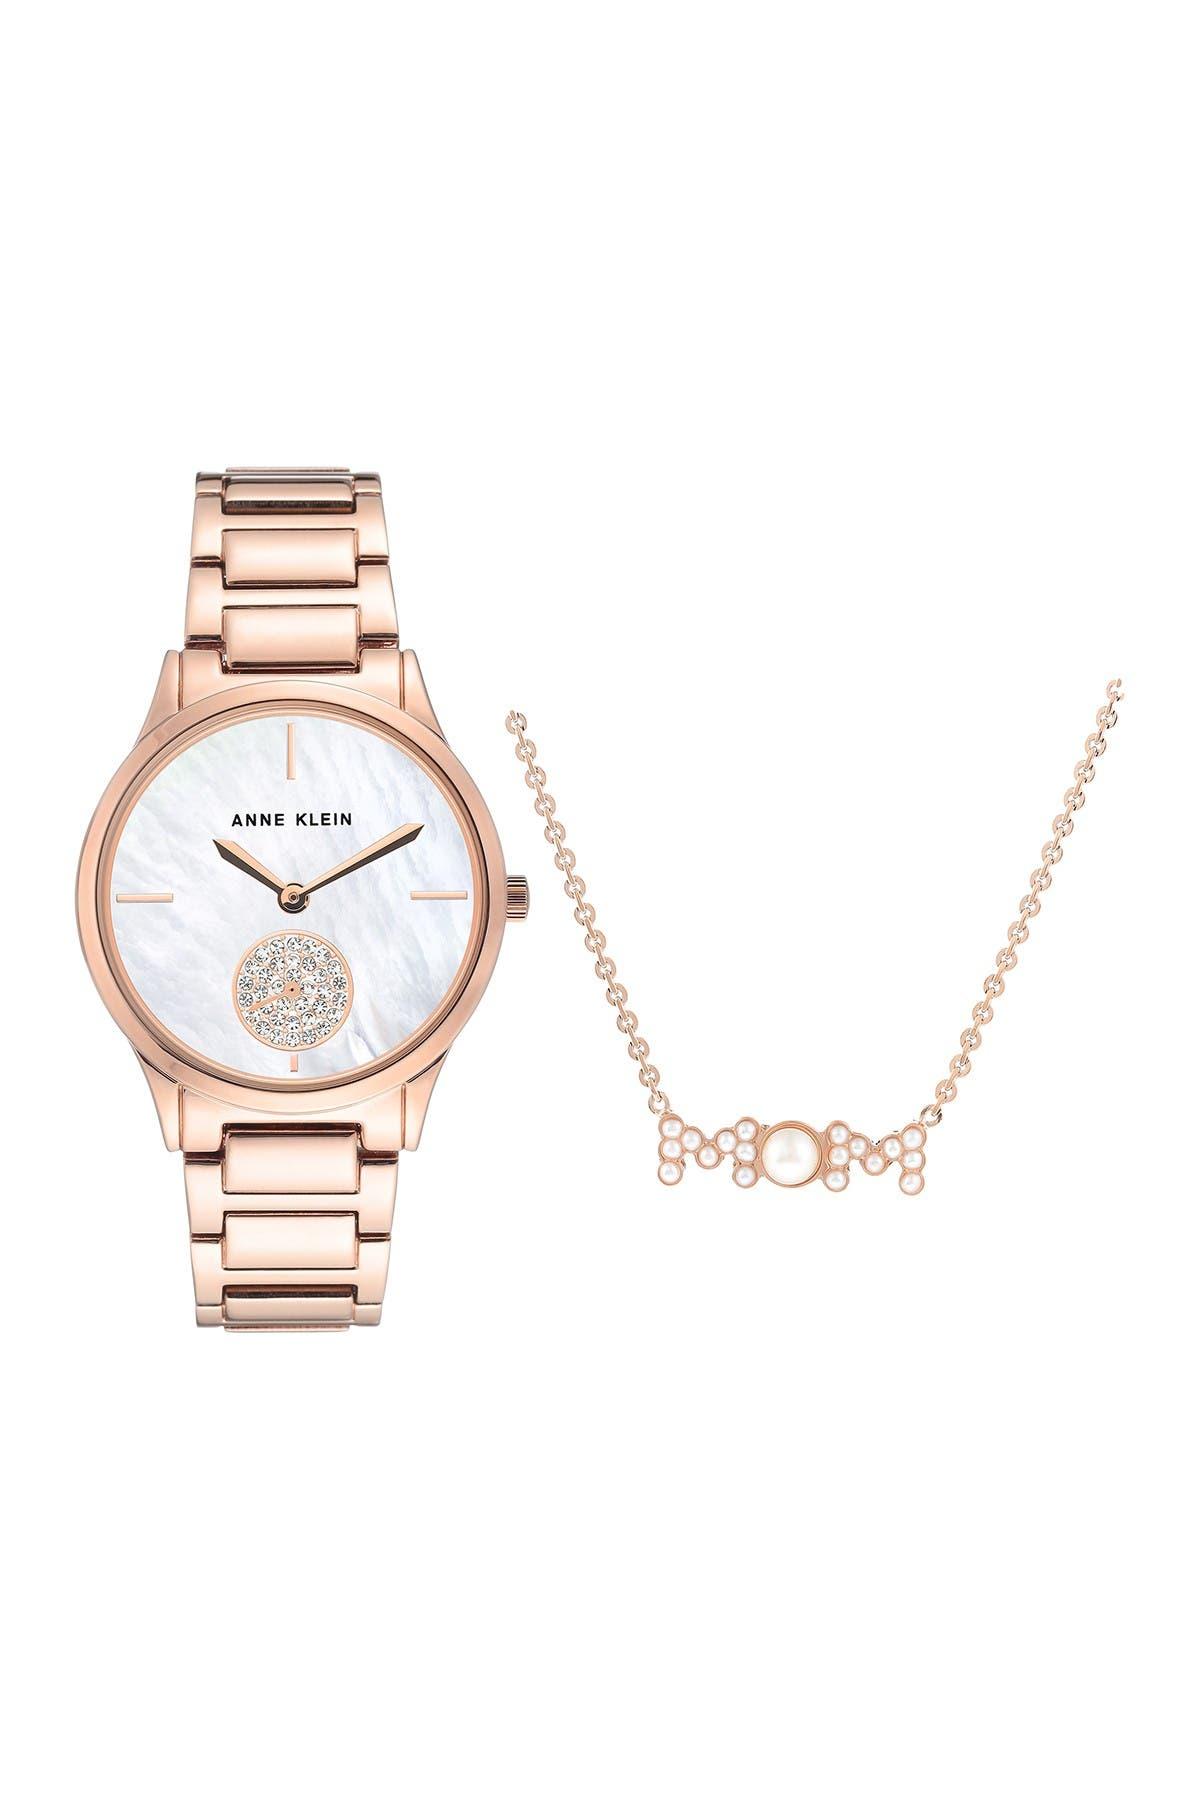 Image of Anne Klein Swarovski Crystal Accented 35mm Watch & Bracelet Set